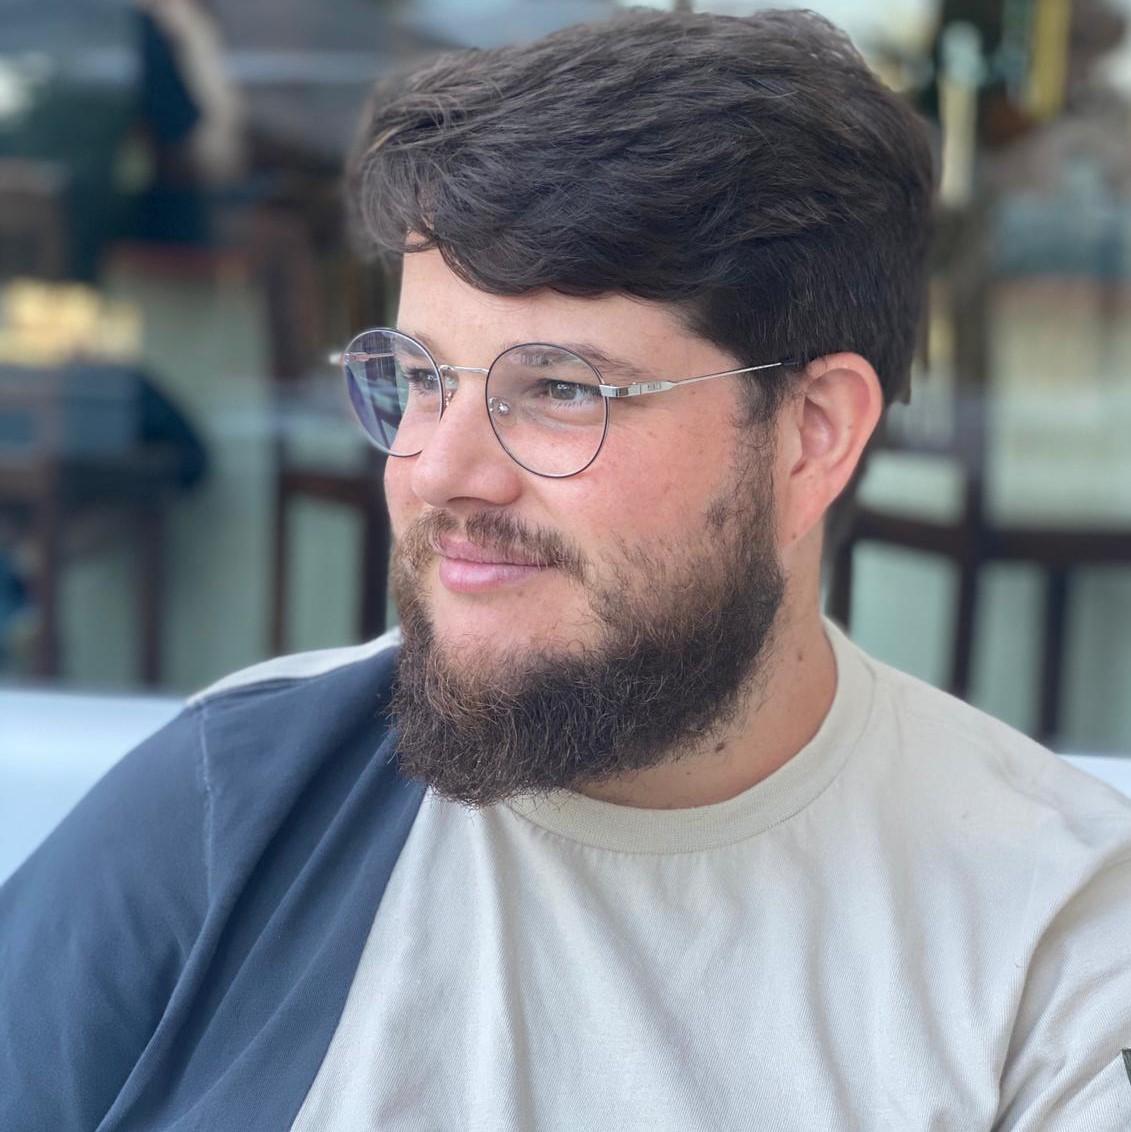 Alejandro Flores Pina